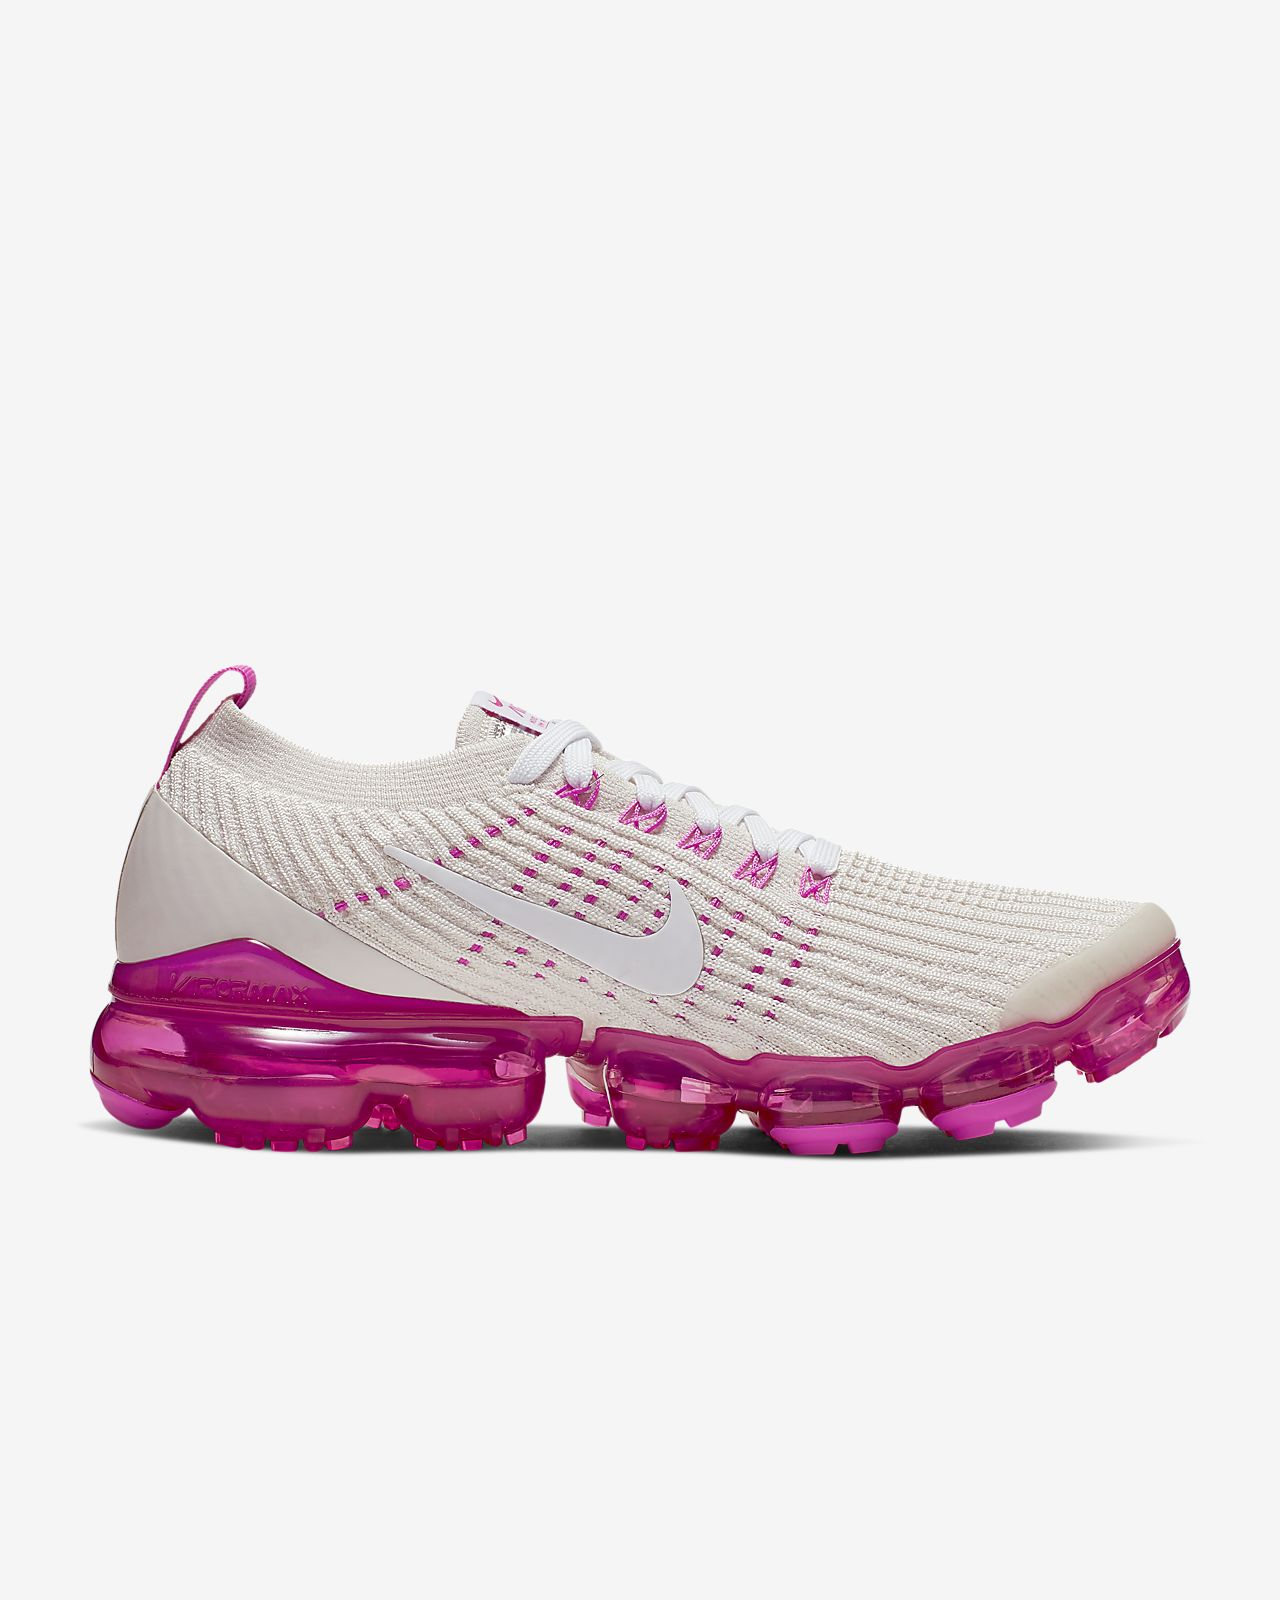 innovative design 7cc54 37430 ... Nike Air VaporMax Flyknit 3 Women s Shoe